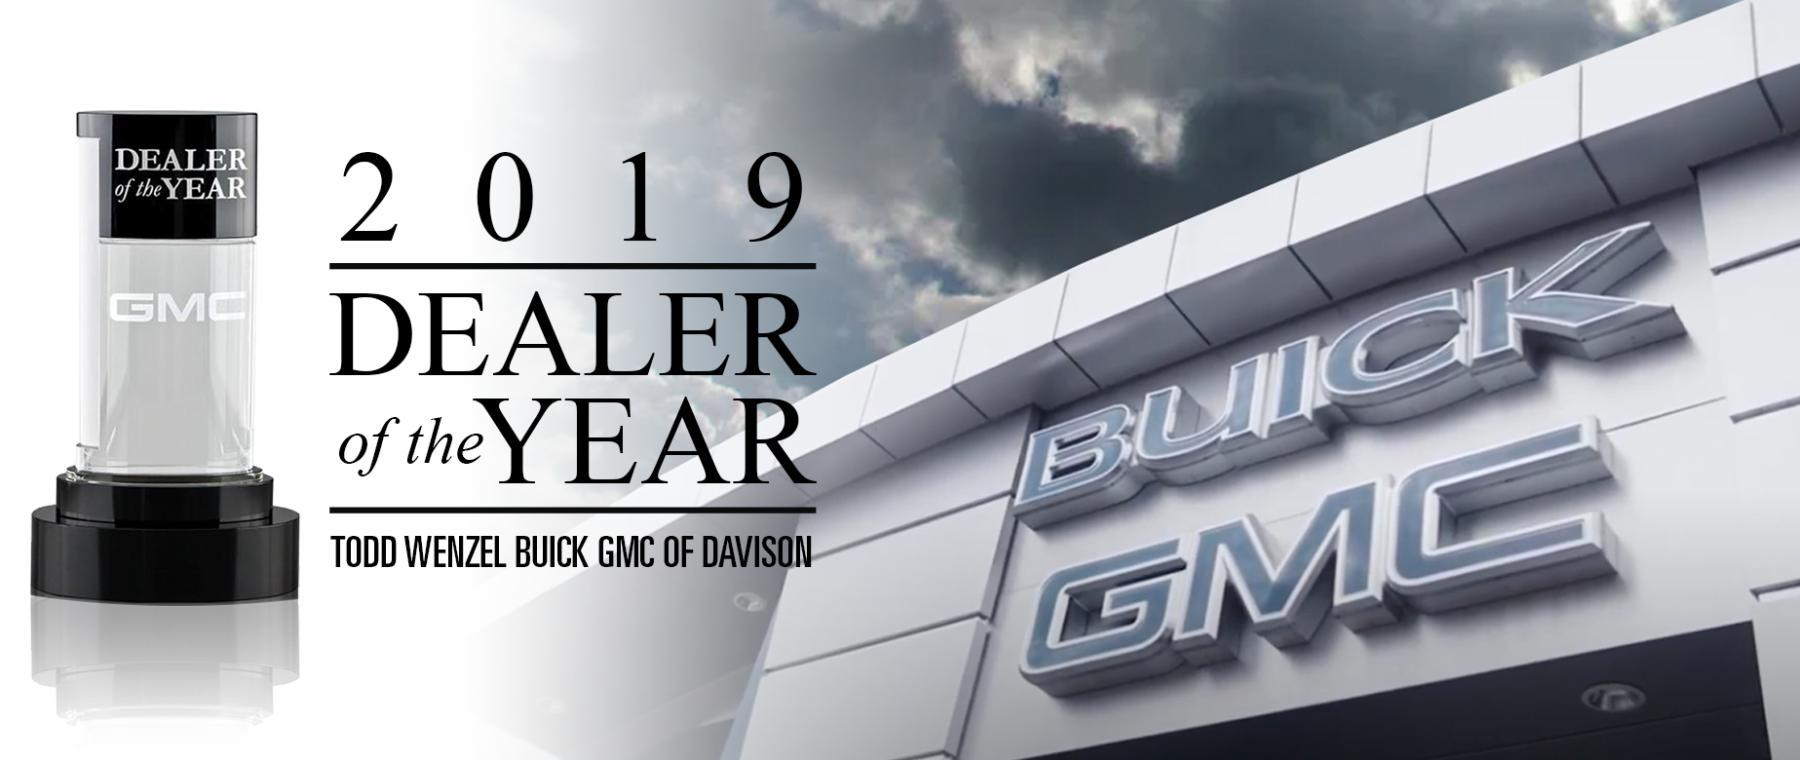 2019 Dealer of the Year Hero